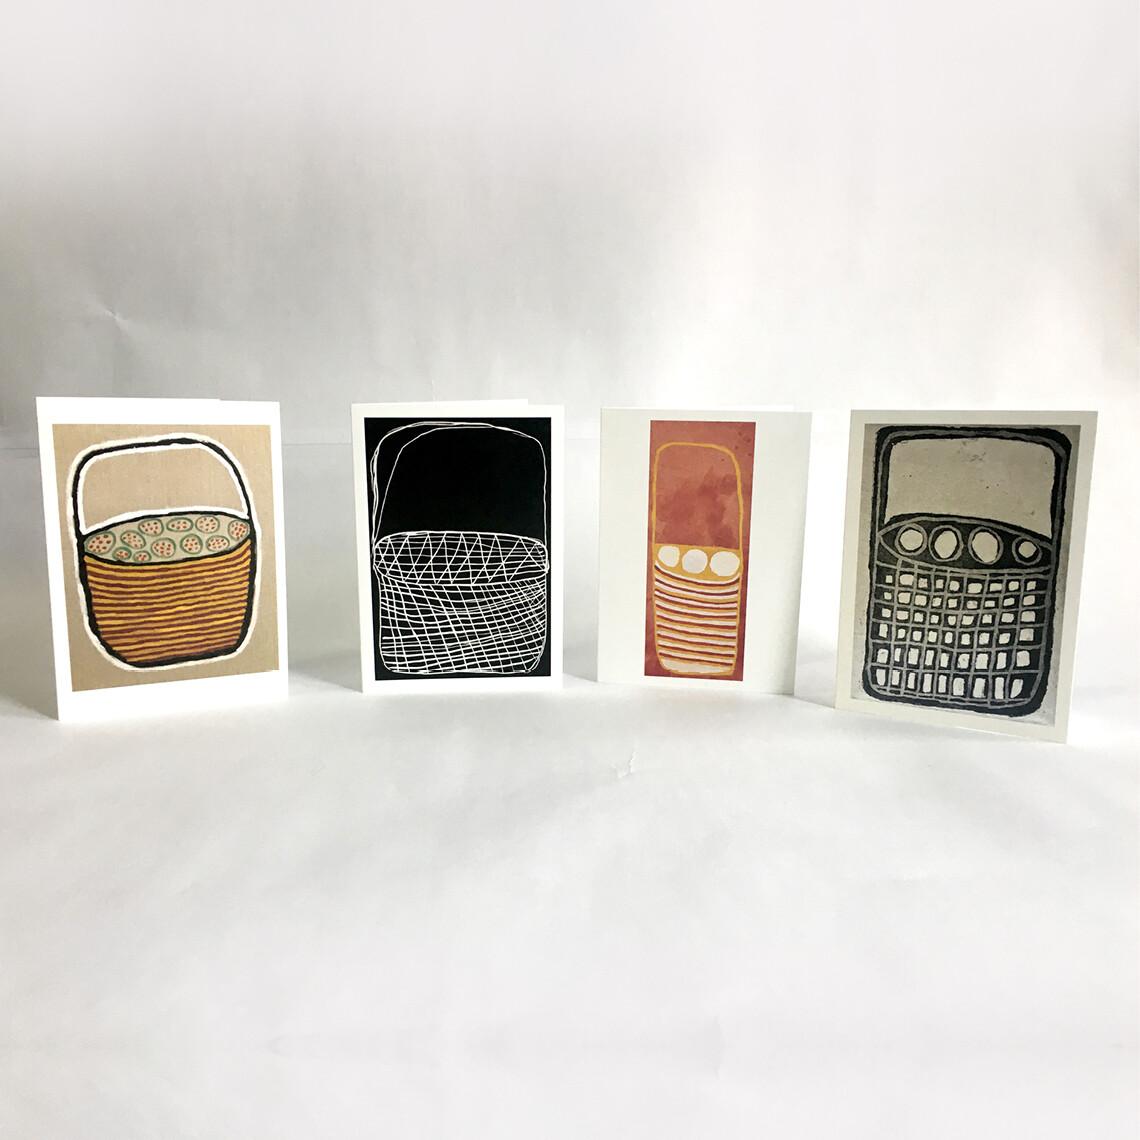 Cards (set of 4) by Cecily Djandjomerr